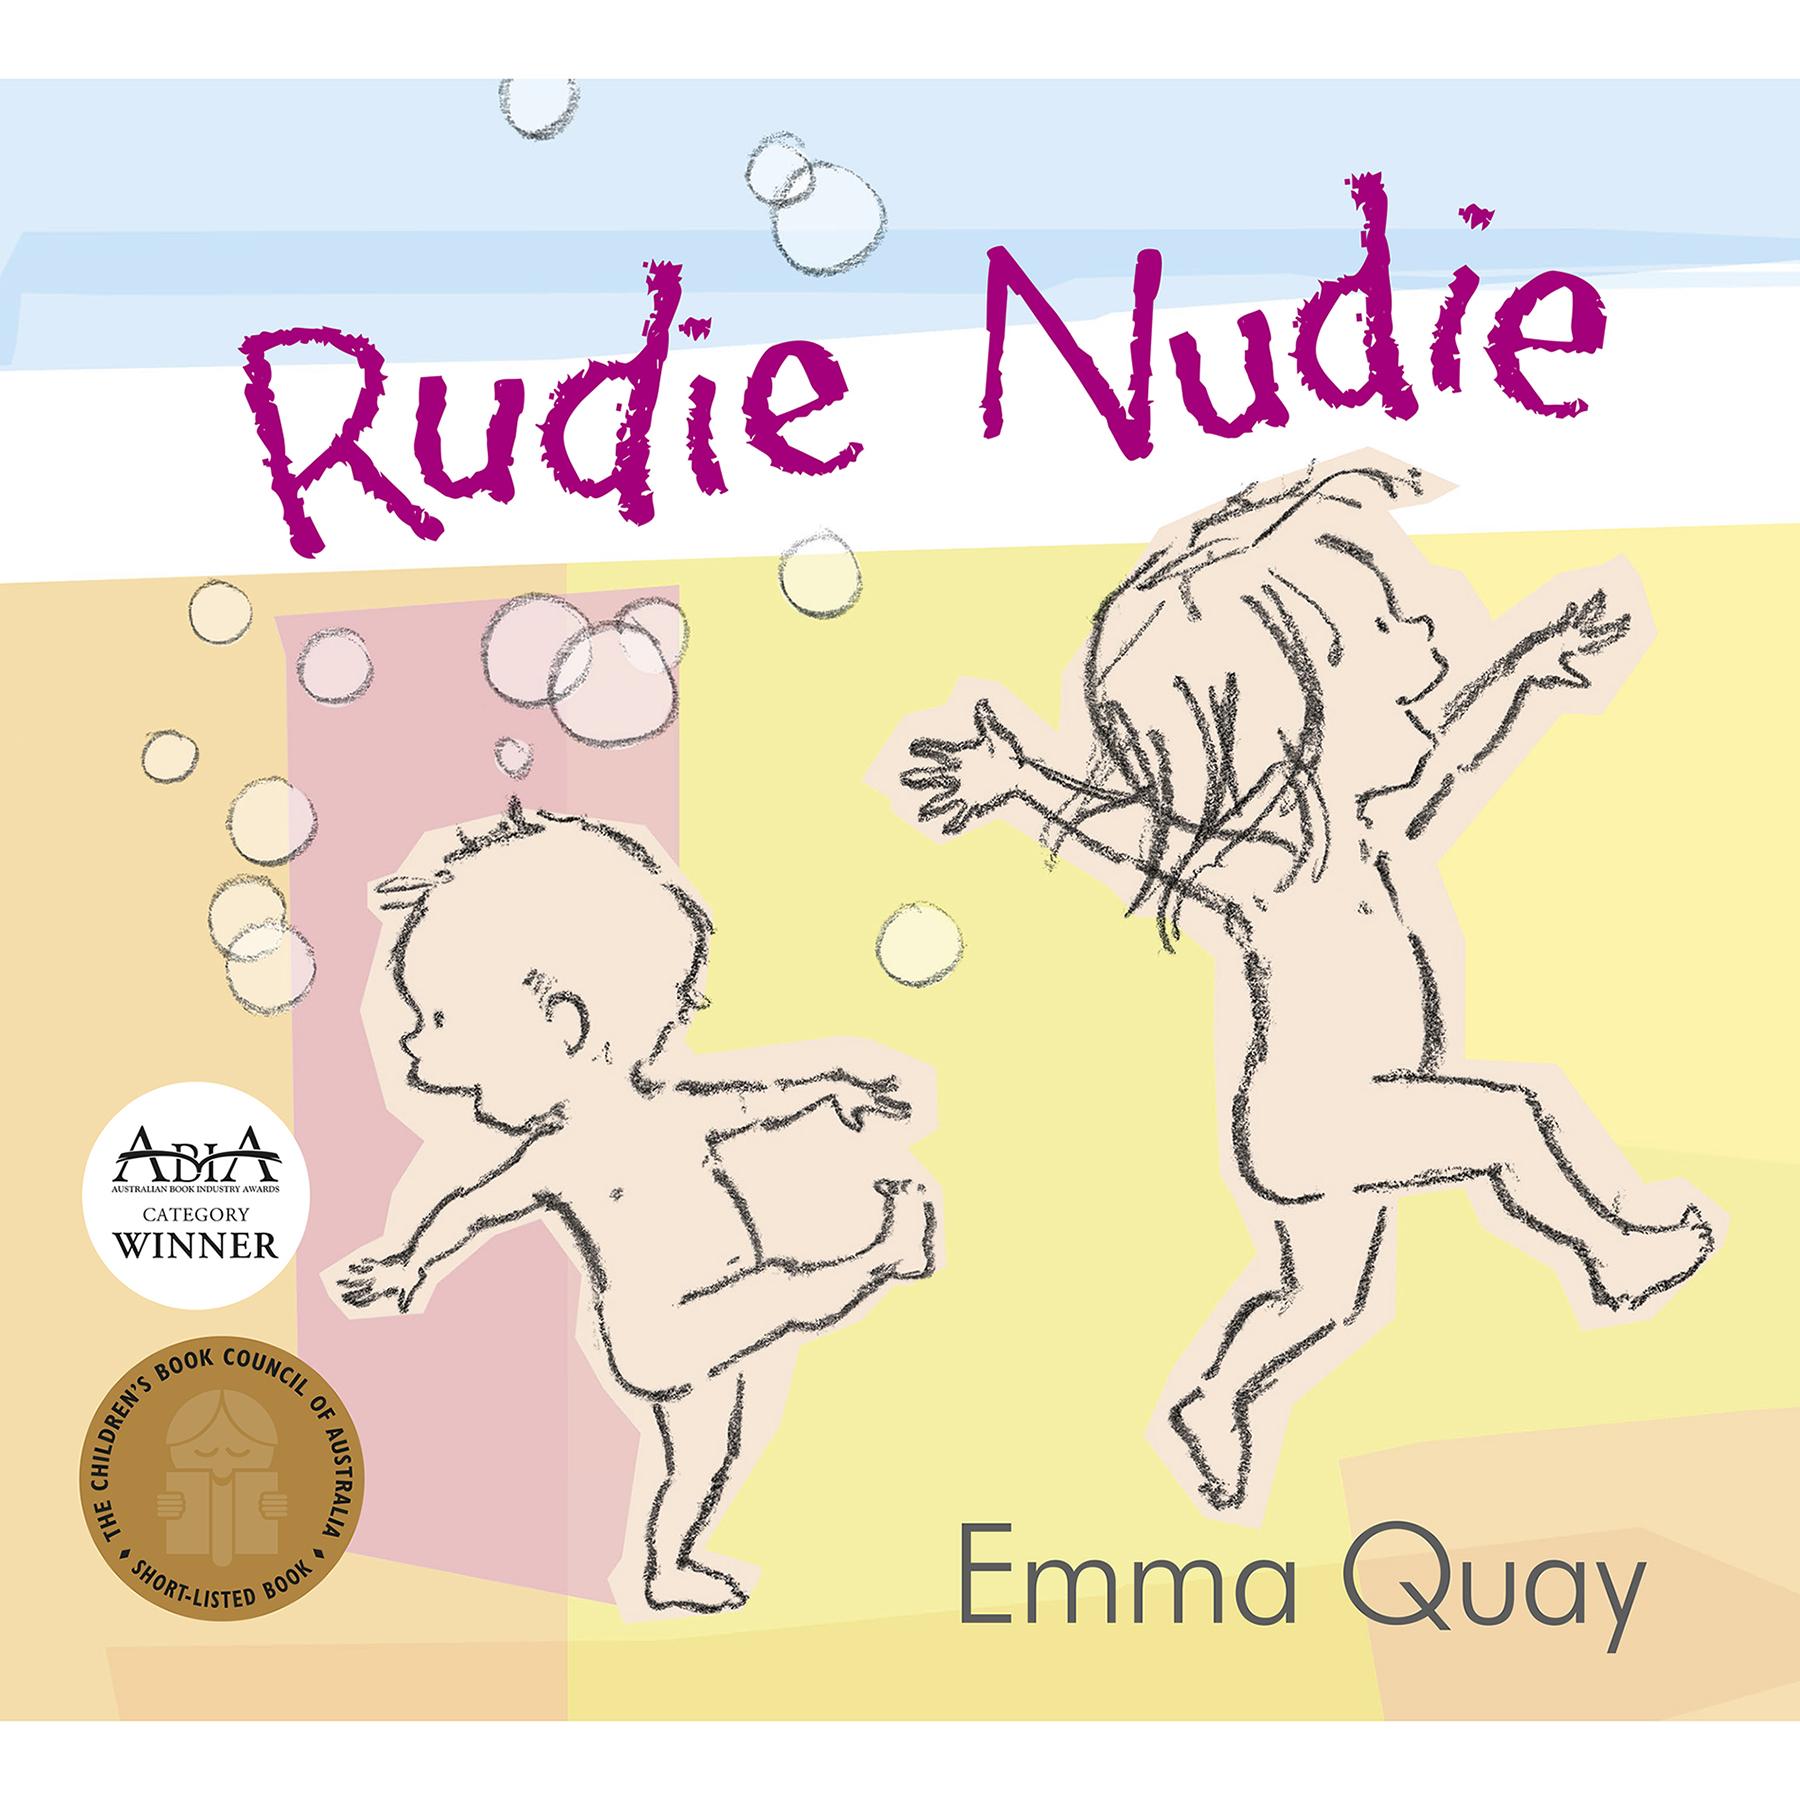 RUDIE NUDIE by Emma Quay (ABC Books)